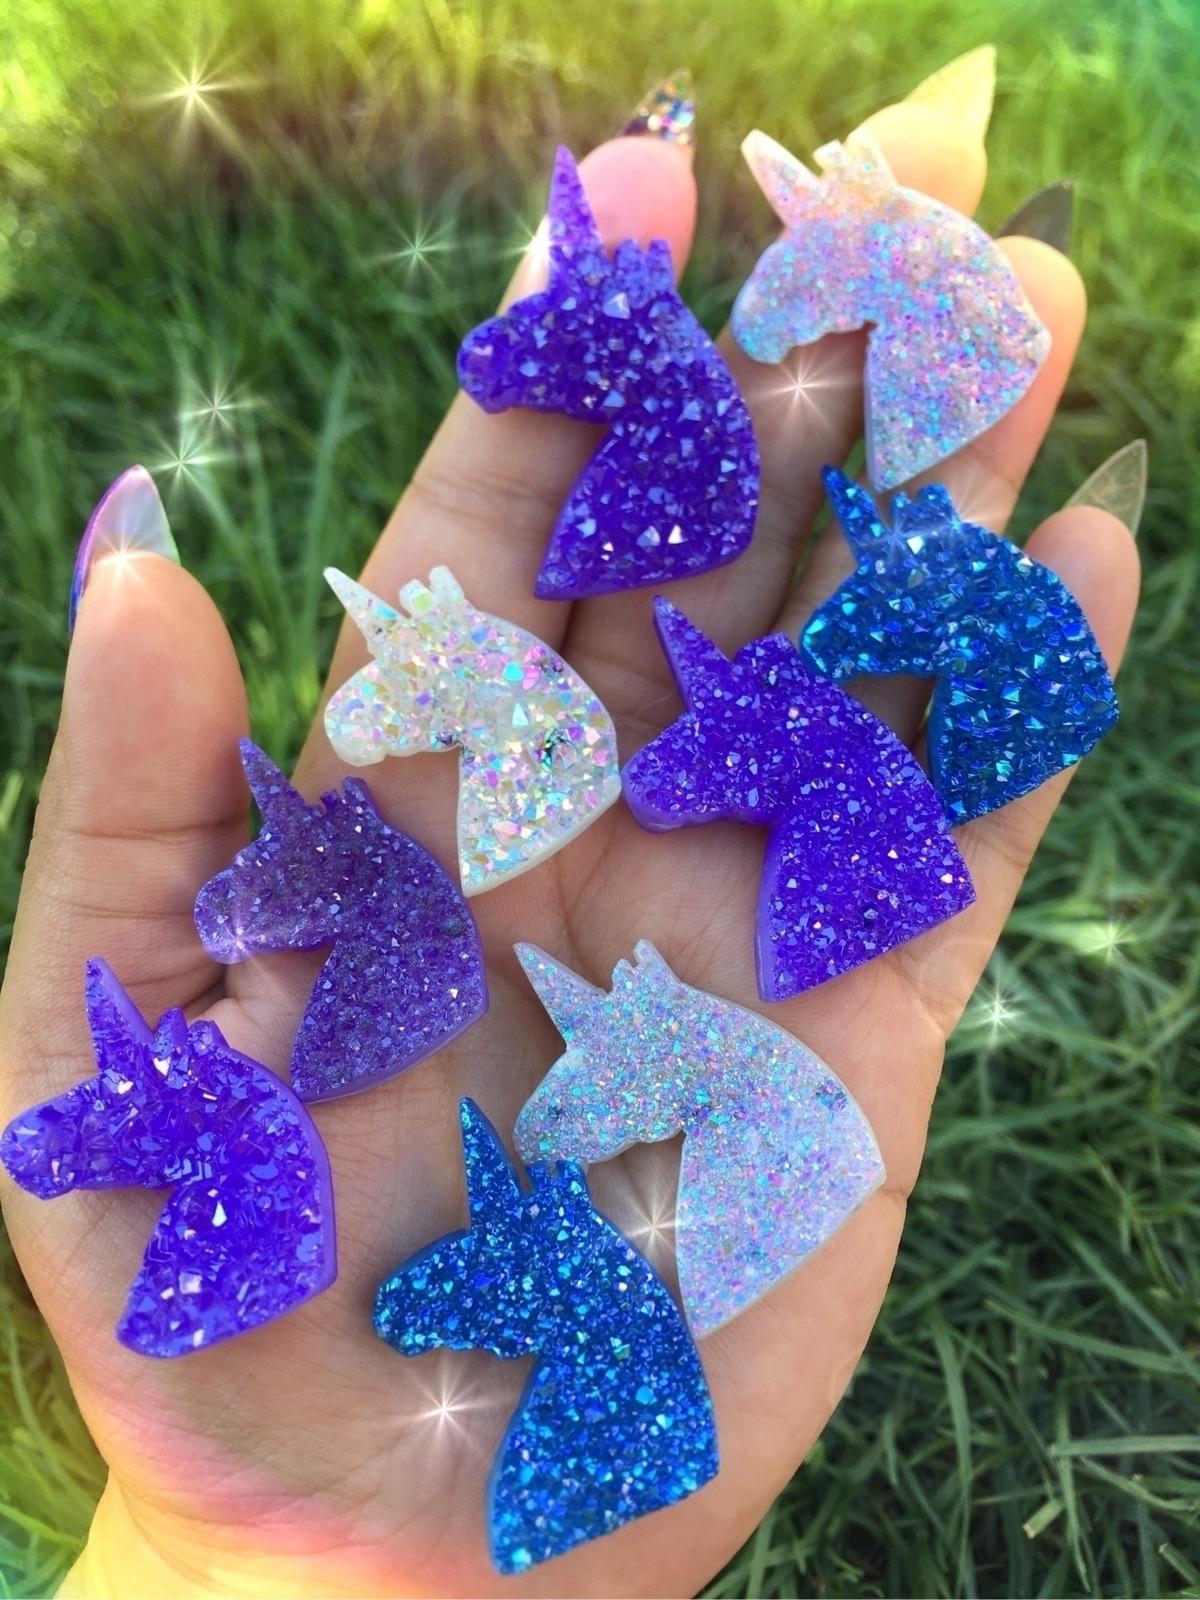 love unicorns - angelaura, rainbowaura - prismsouls | ello